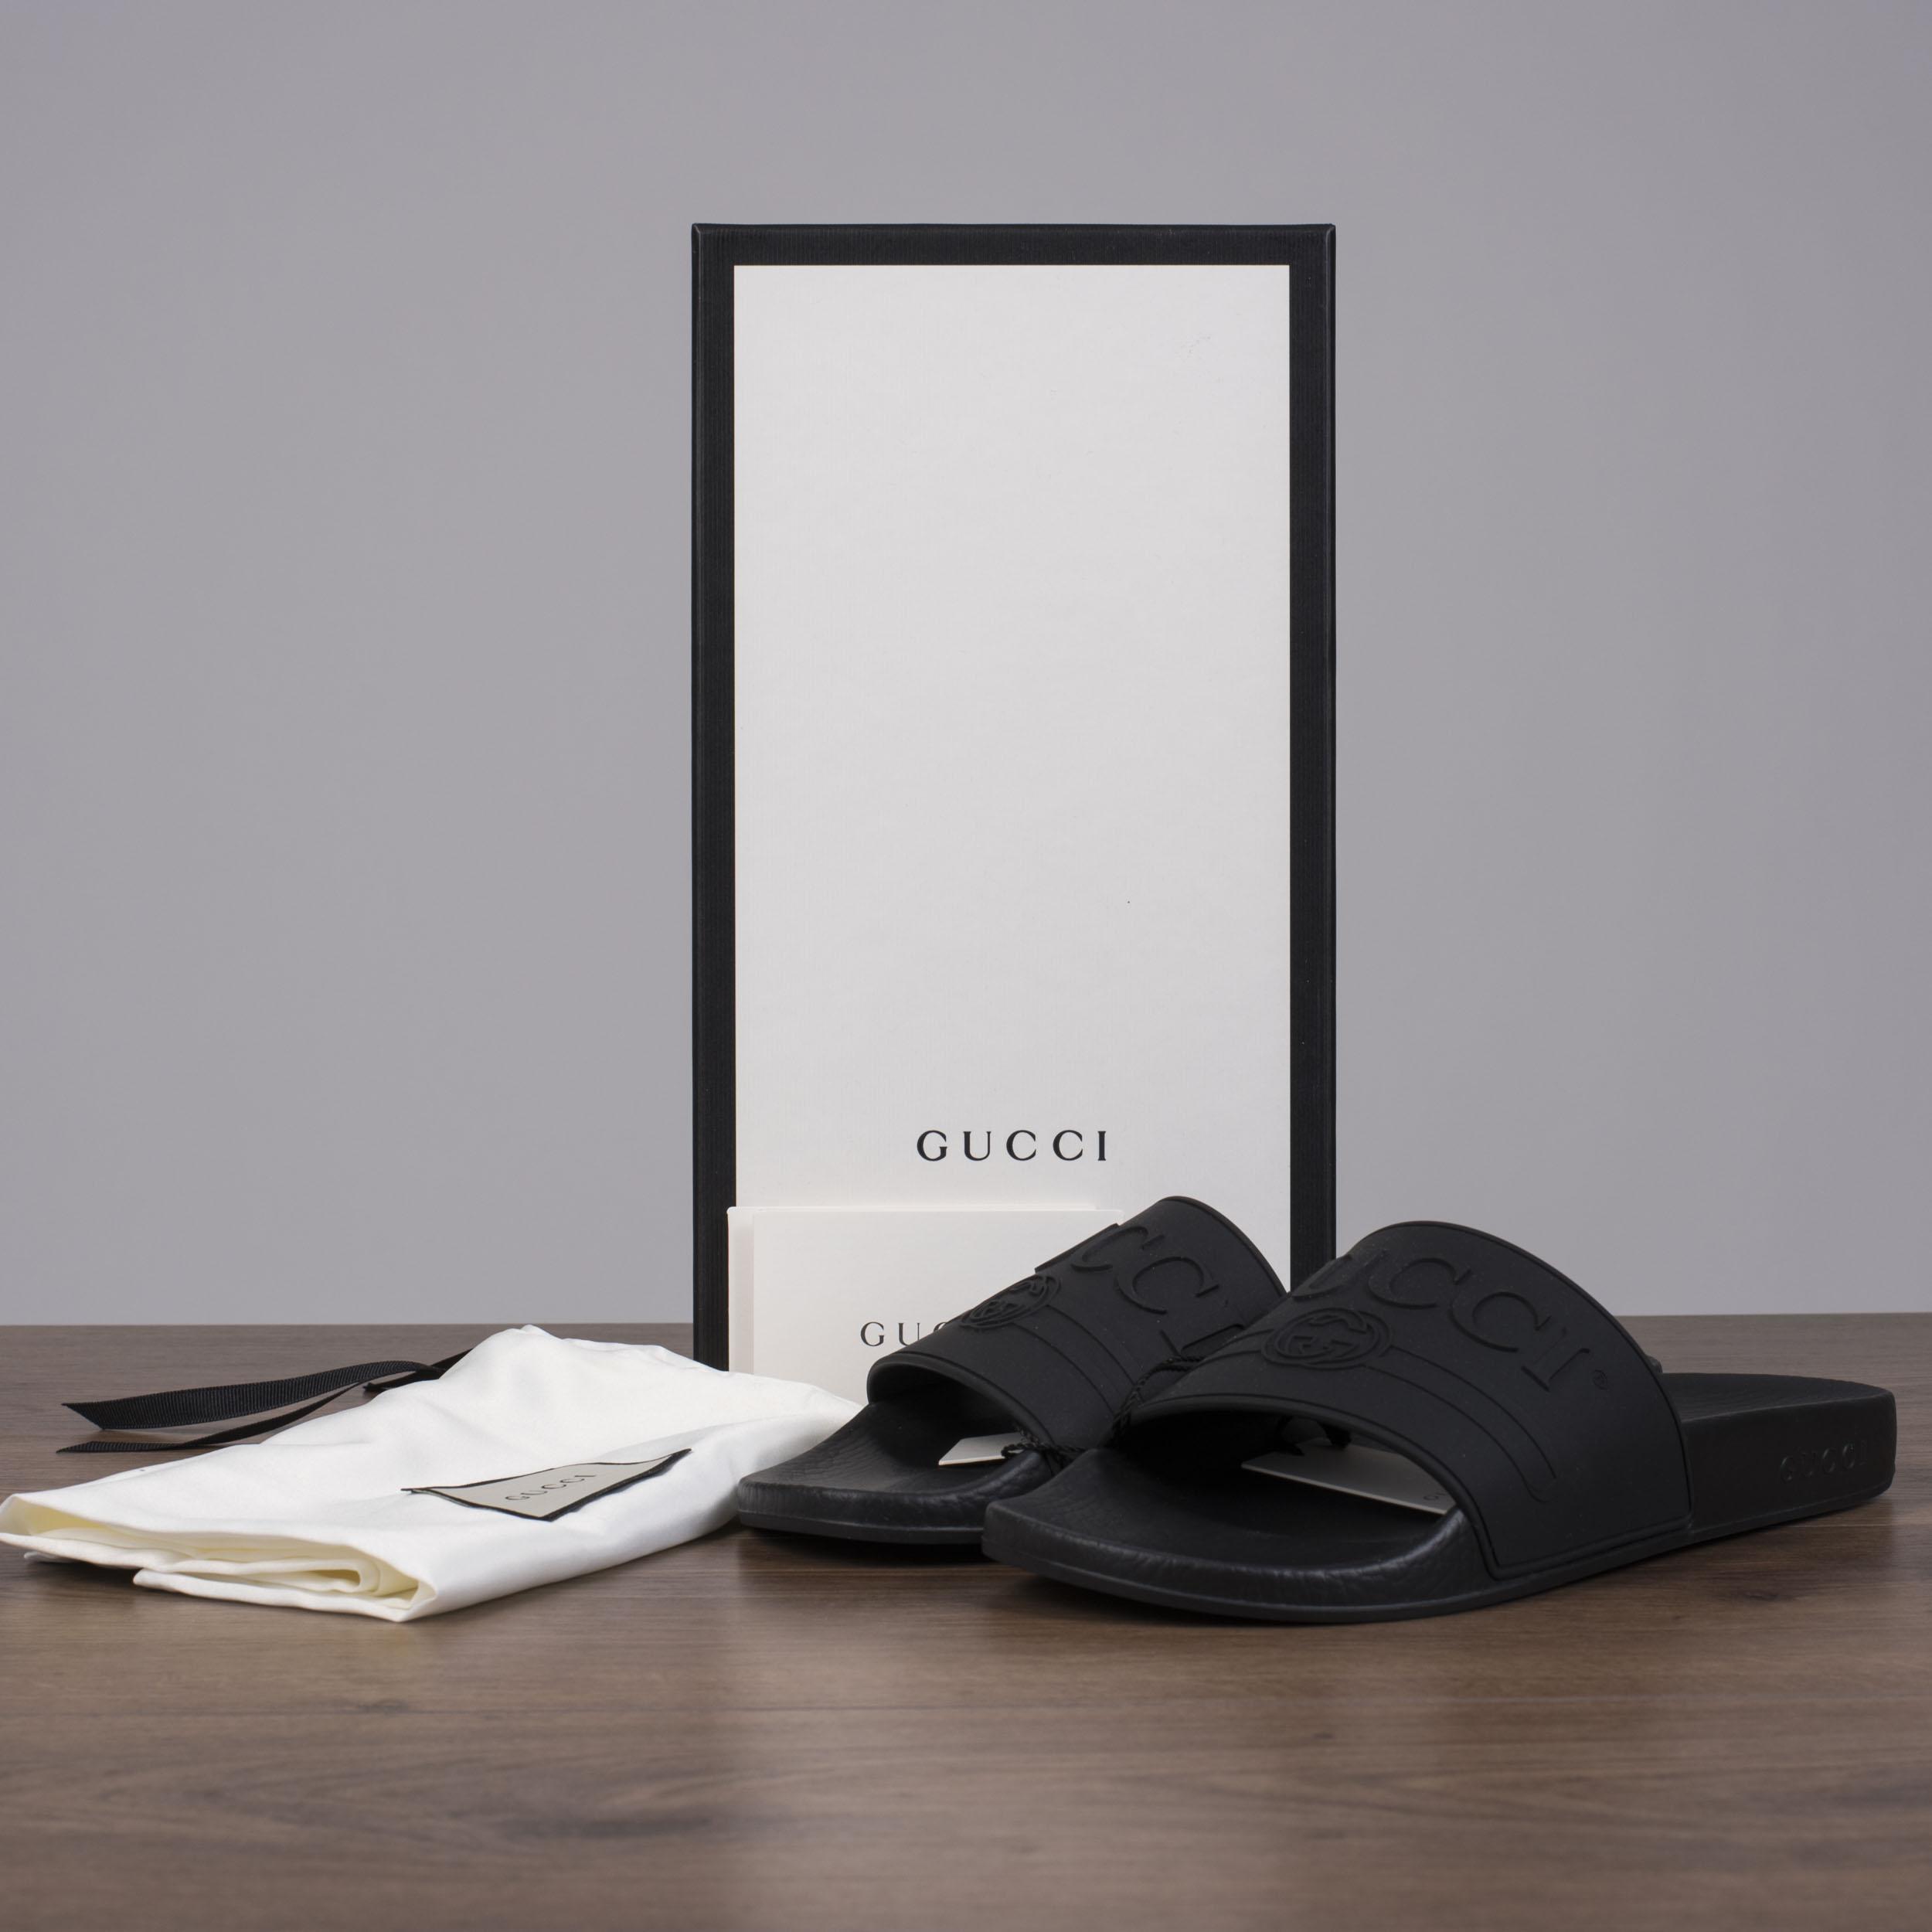 Details about GUCCI 250$ Women\u0027s Logo Slide Sandals In Black Rubber